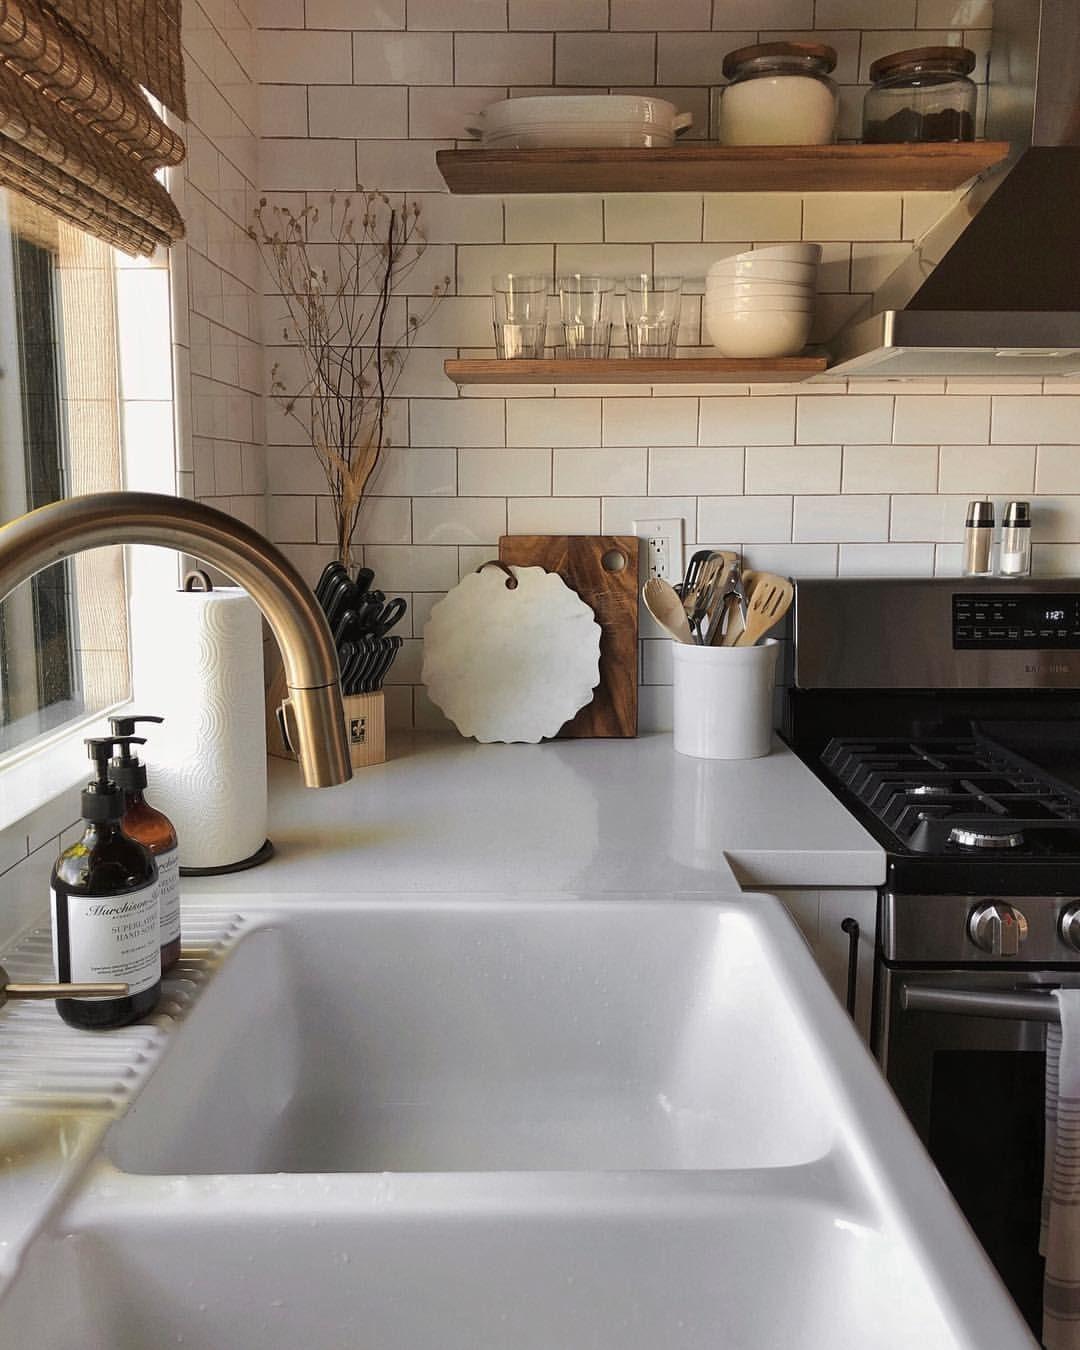 Gℯmary Gemary On Instagram Not The Biggest Corner But It S My Favorite Little Corner Kitchen Corner Sink Kitchen Kitchen Remodel Kitchen Renovation